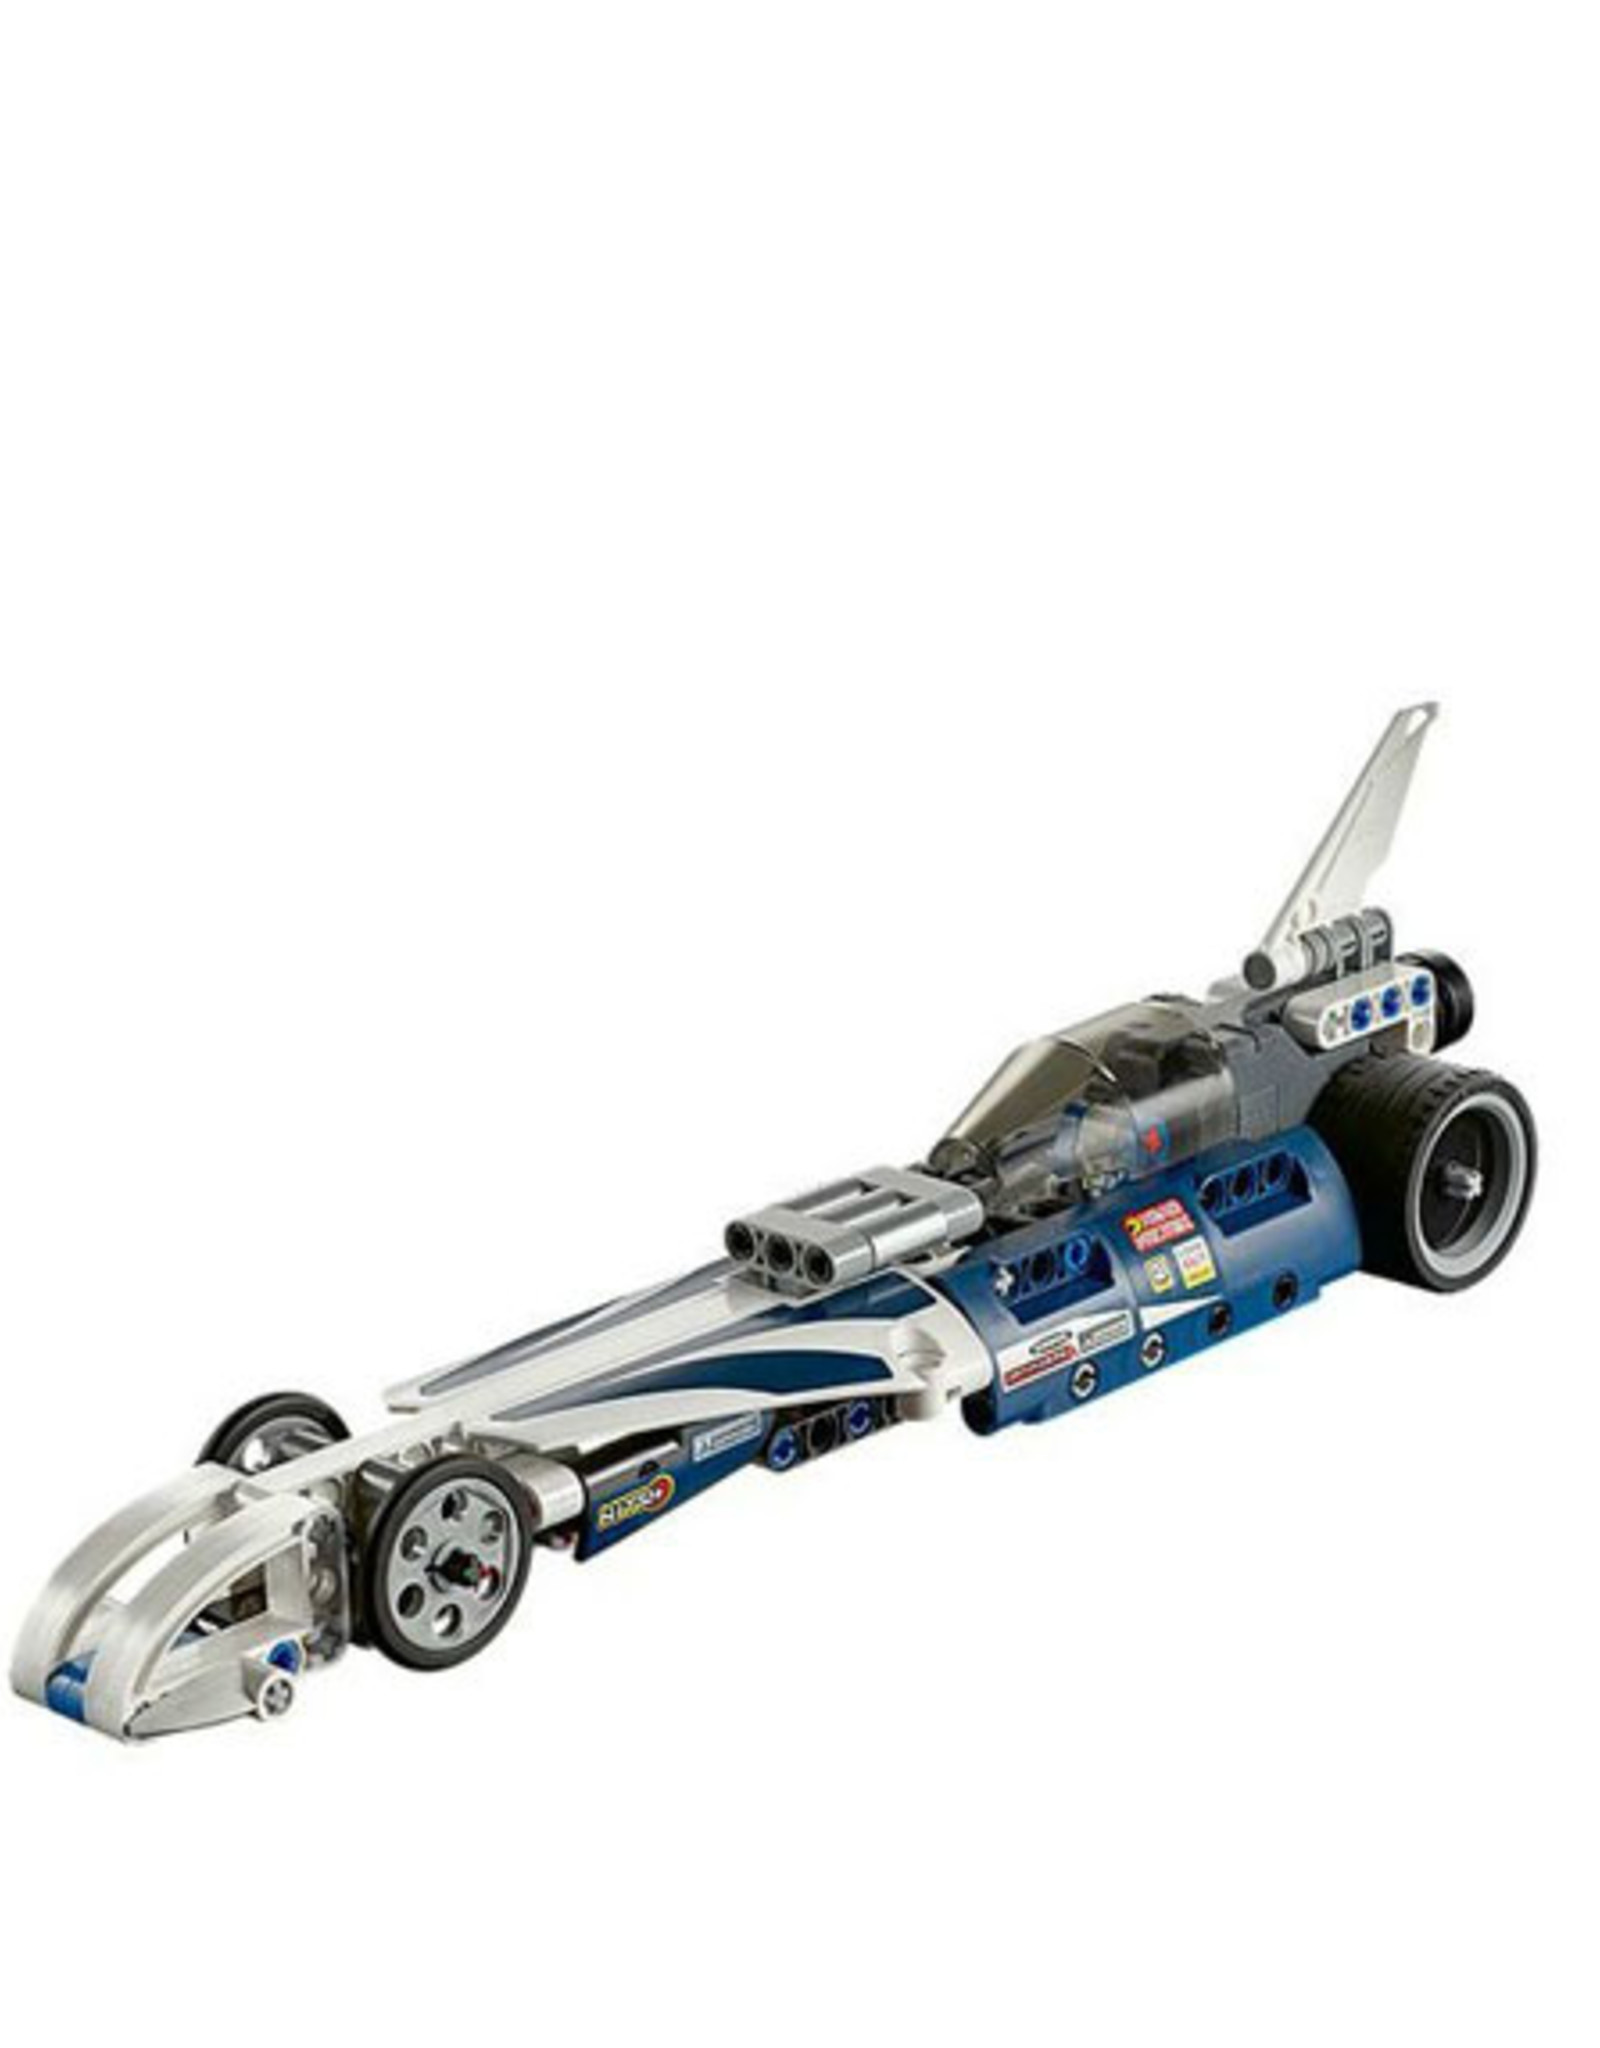 LEGO LEGO 42033 Record Breaker TECHNIC